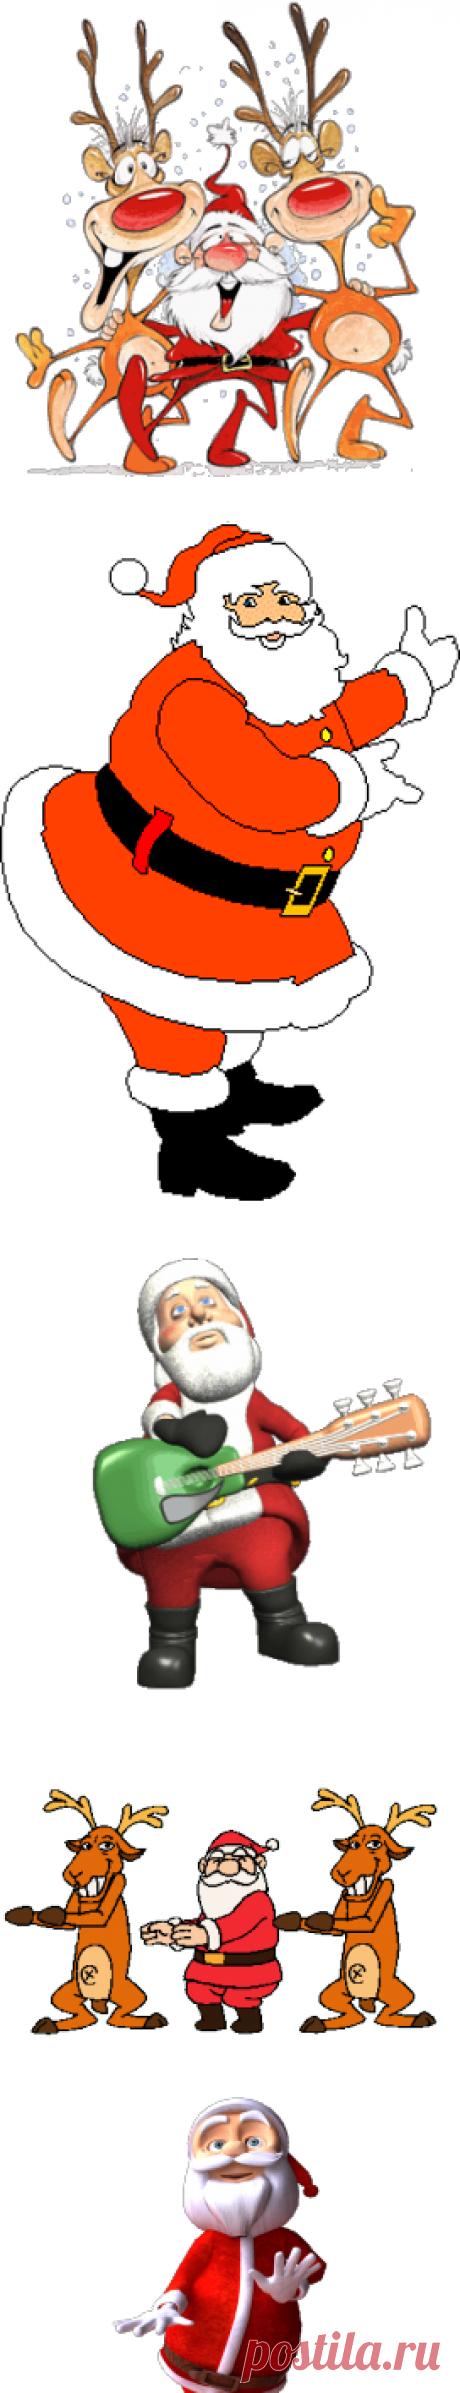 Танцующий дед Мороз Gif - Календари и другая графика